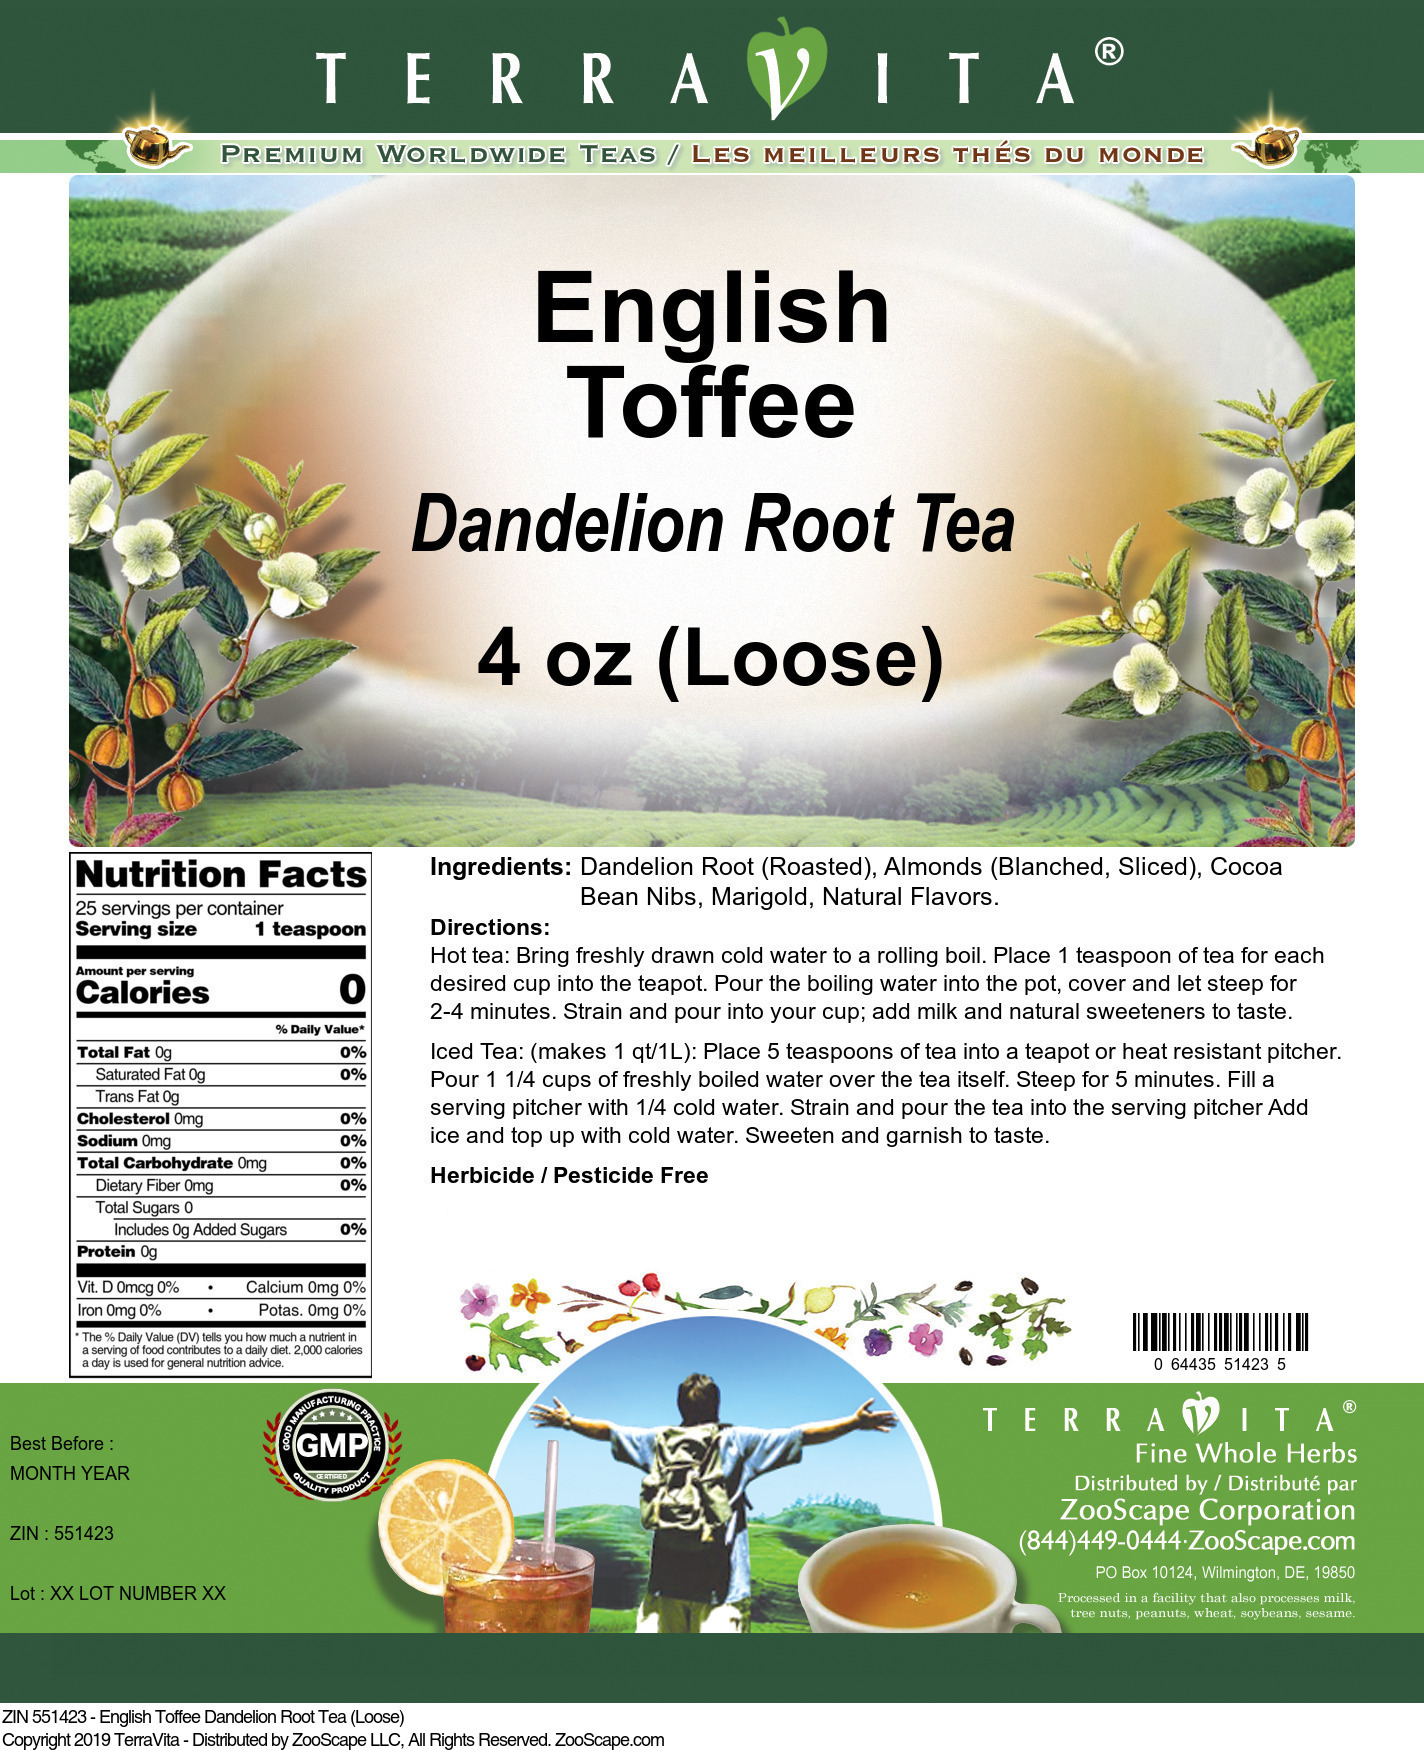 English Toffee Dandelion Root Tea (Loose)